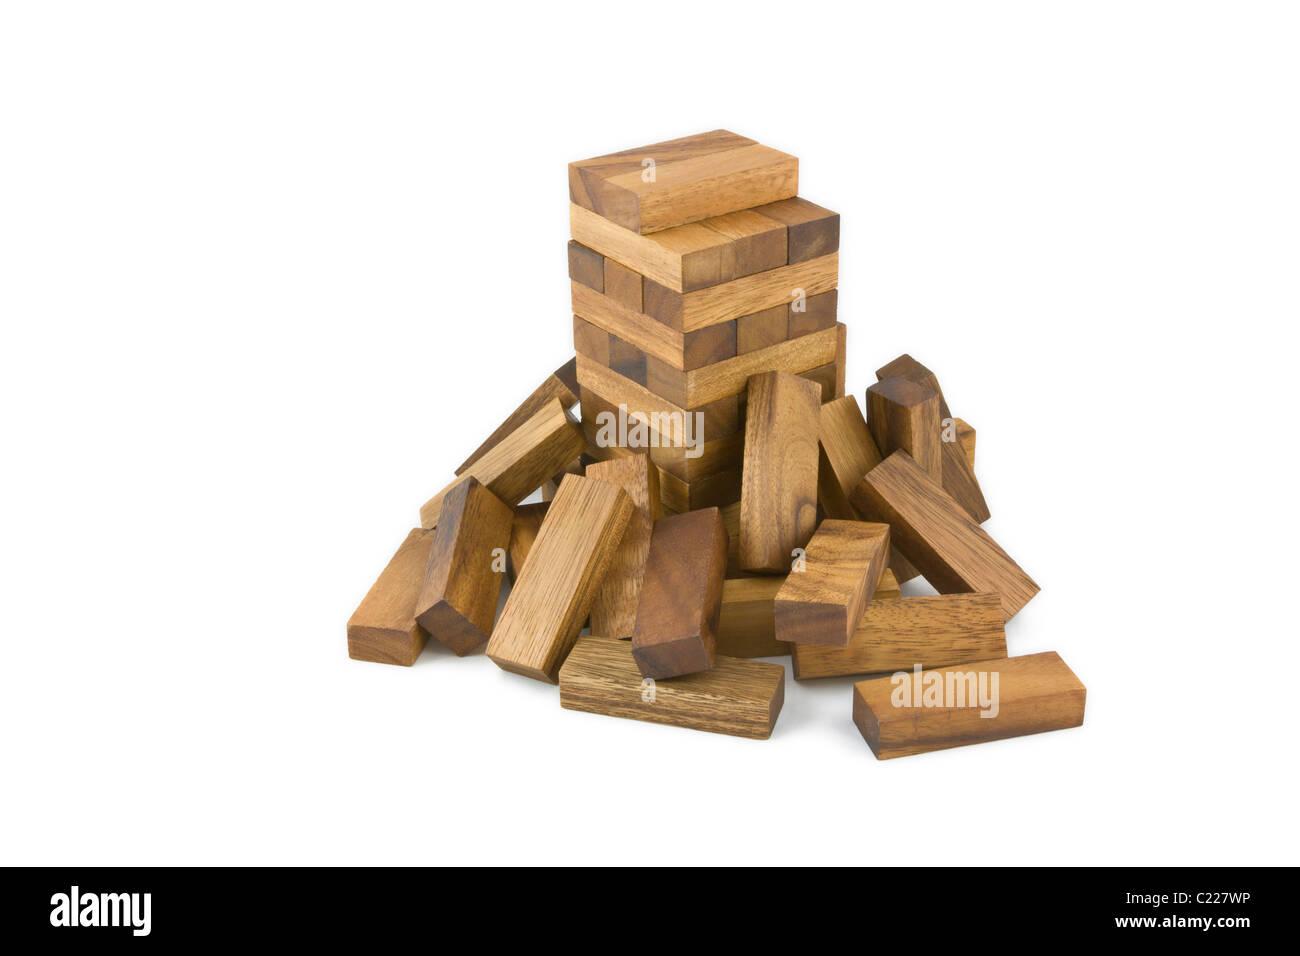 Jenga wooden block game - Stock Image